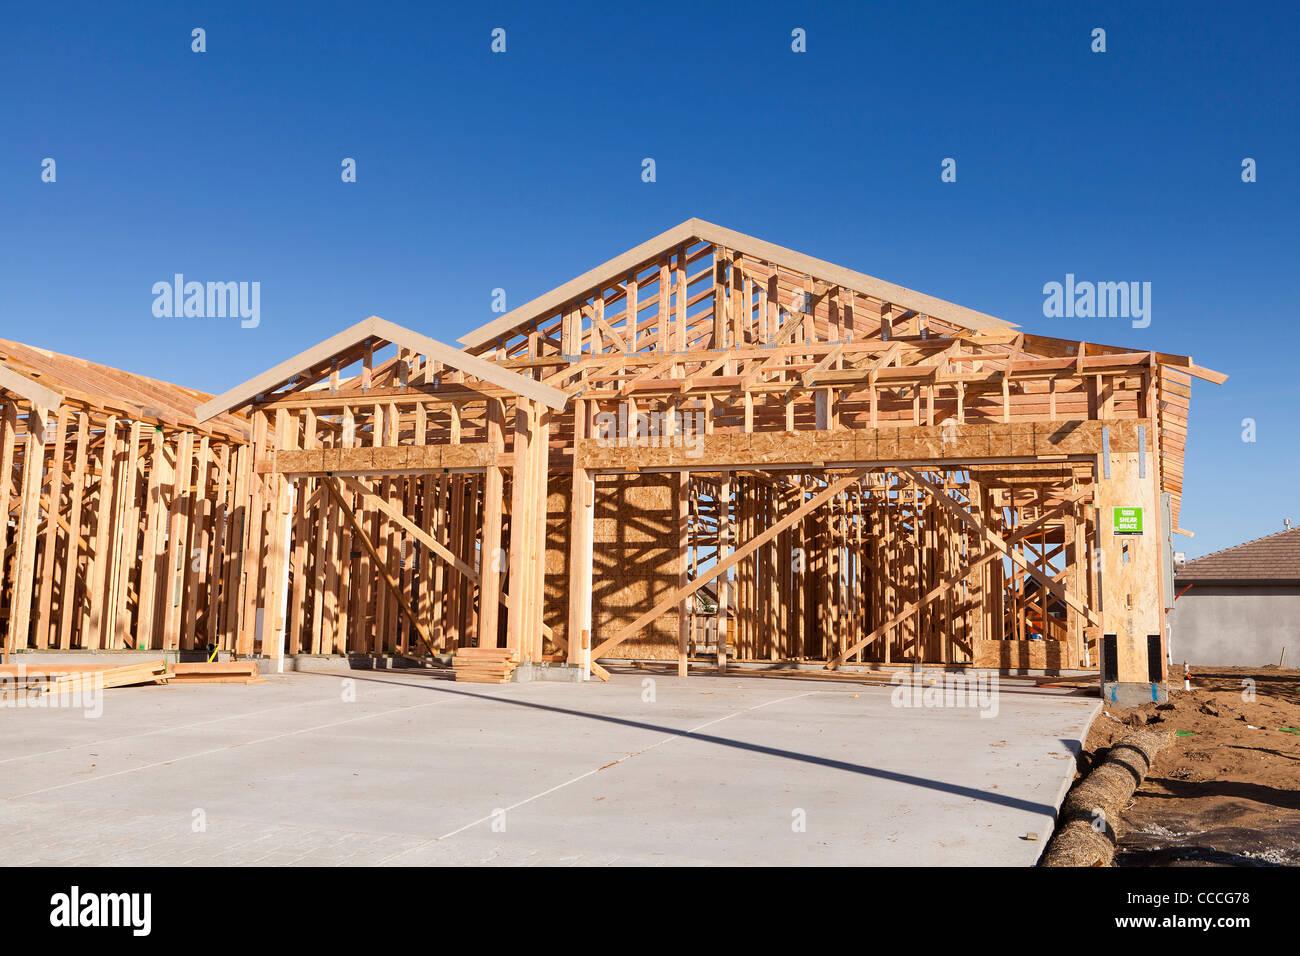 Stage Frame House Stockfotos & Stage Frame House Bilder - Alamy